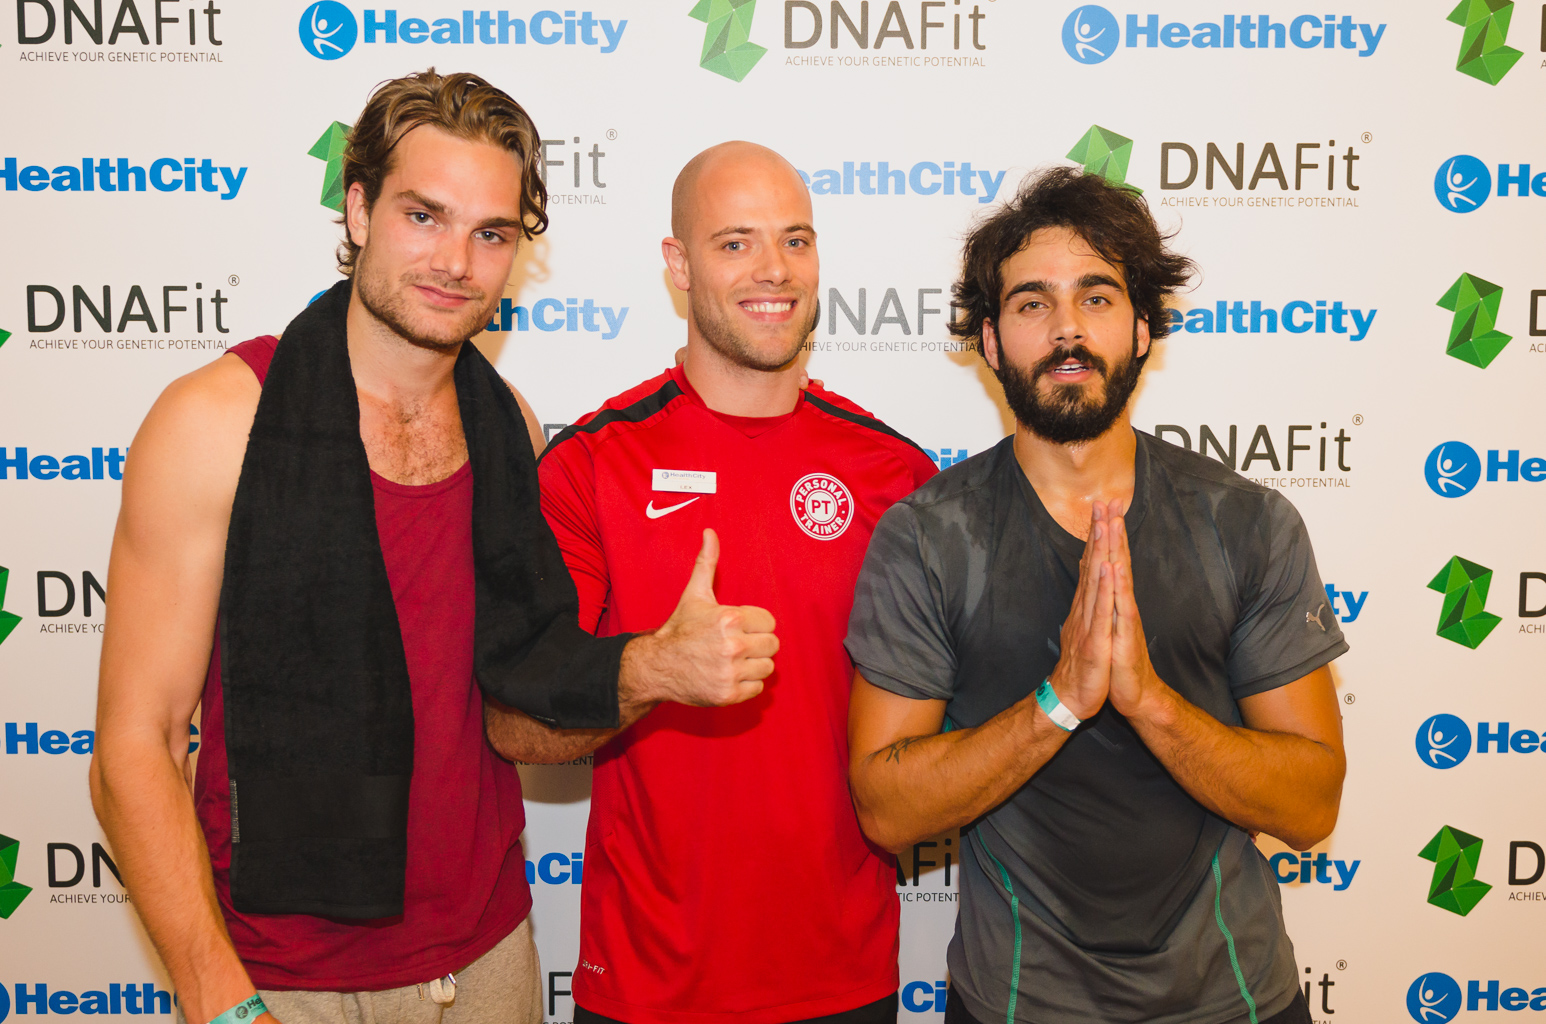 20140917 Healthcity DNAFit-041